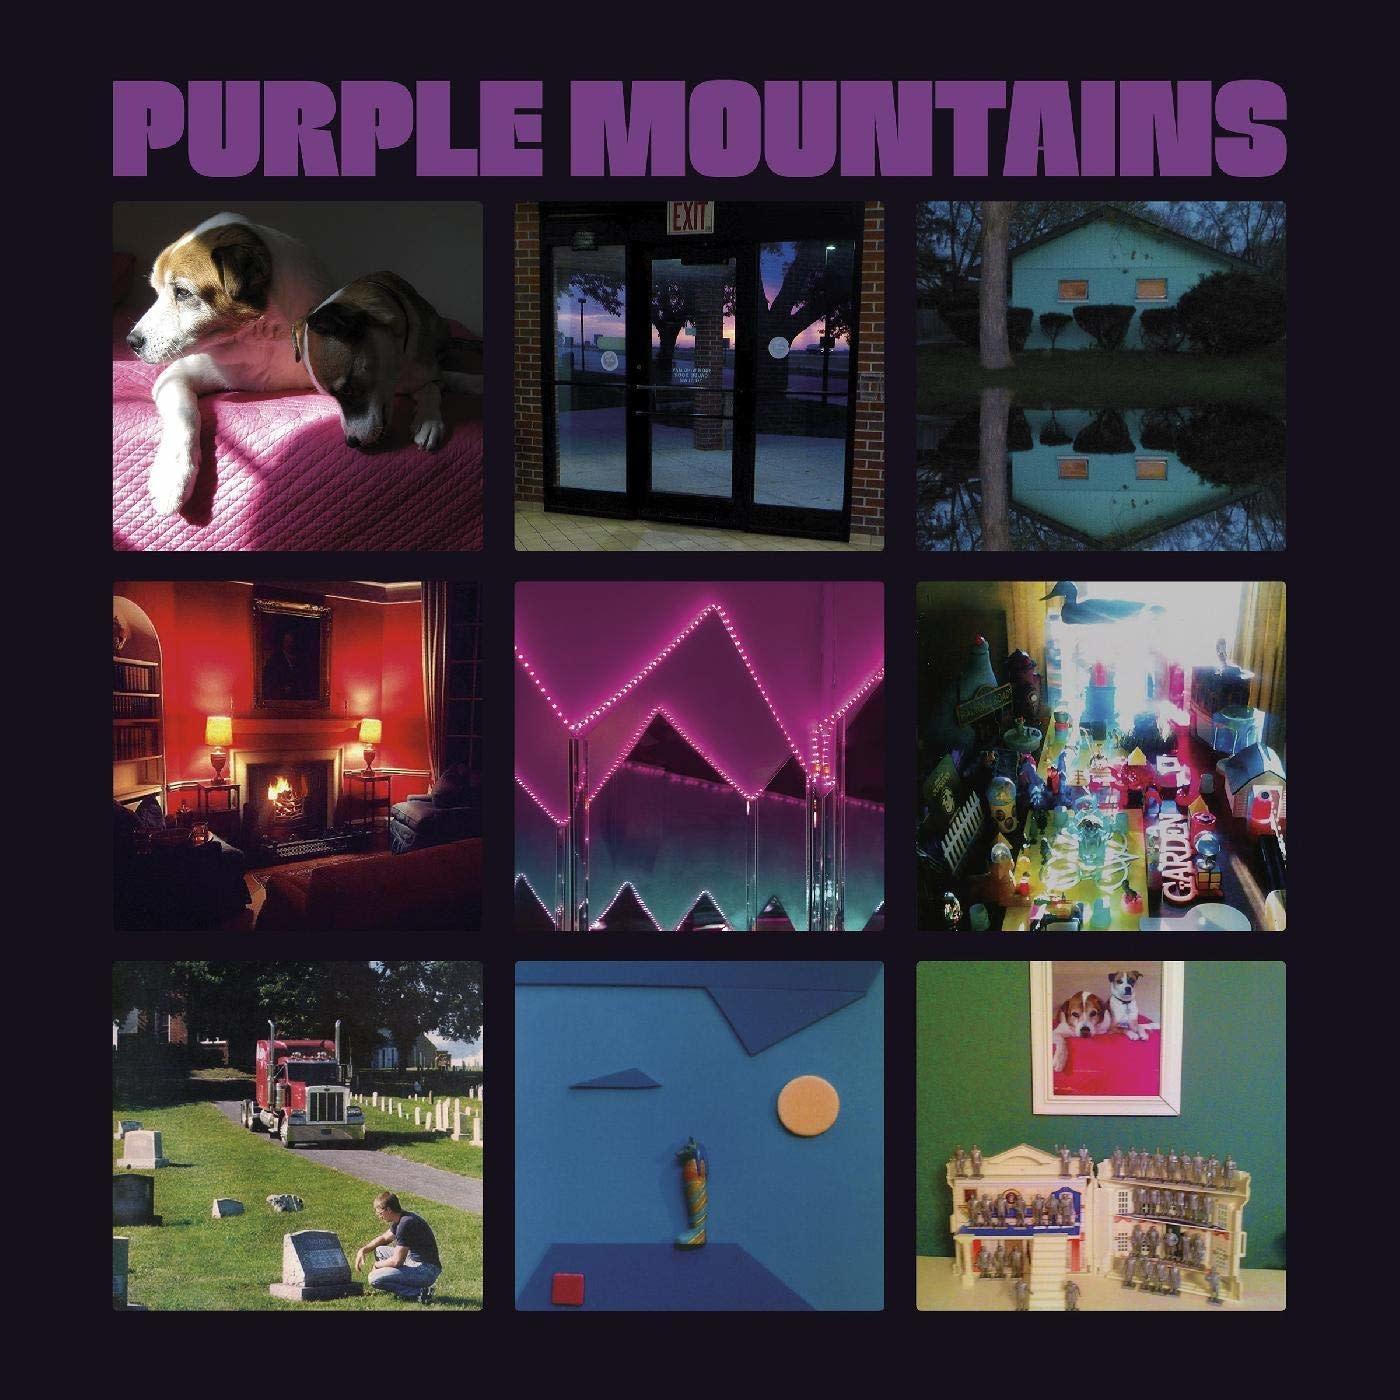 Purple Mountains - Purple Mountains